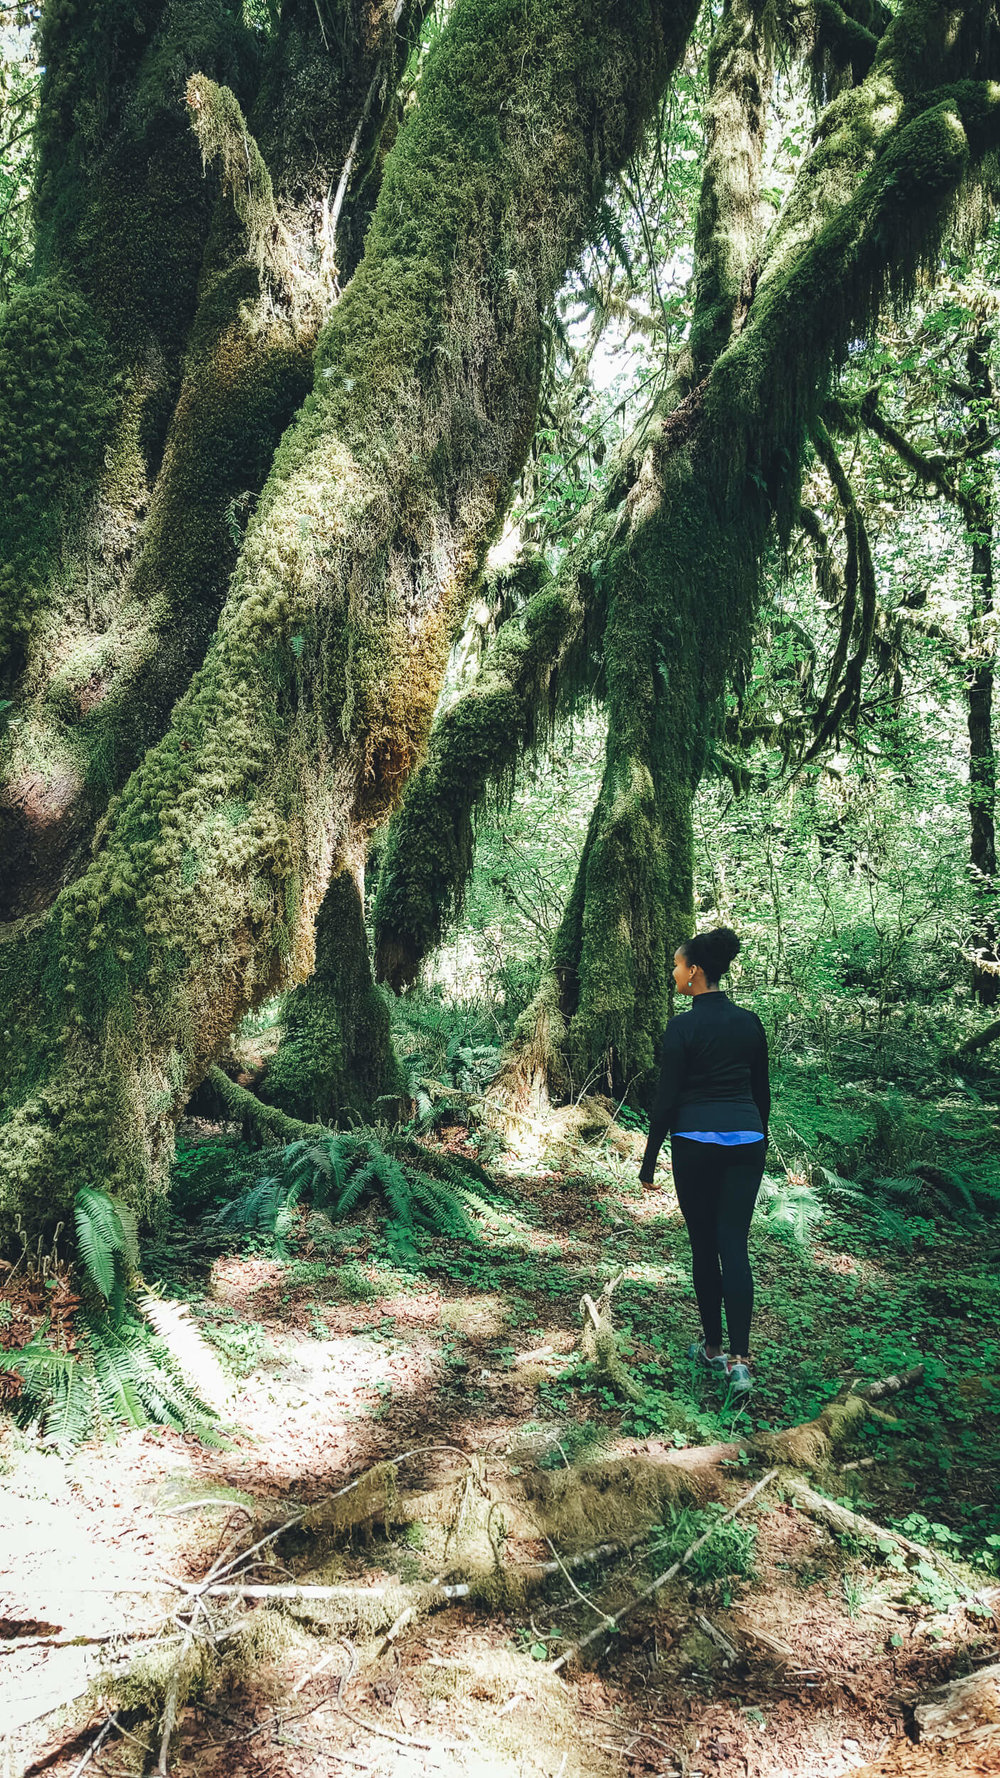 ochristine-nps-outdoor-travel-blogger